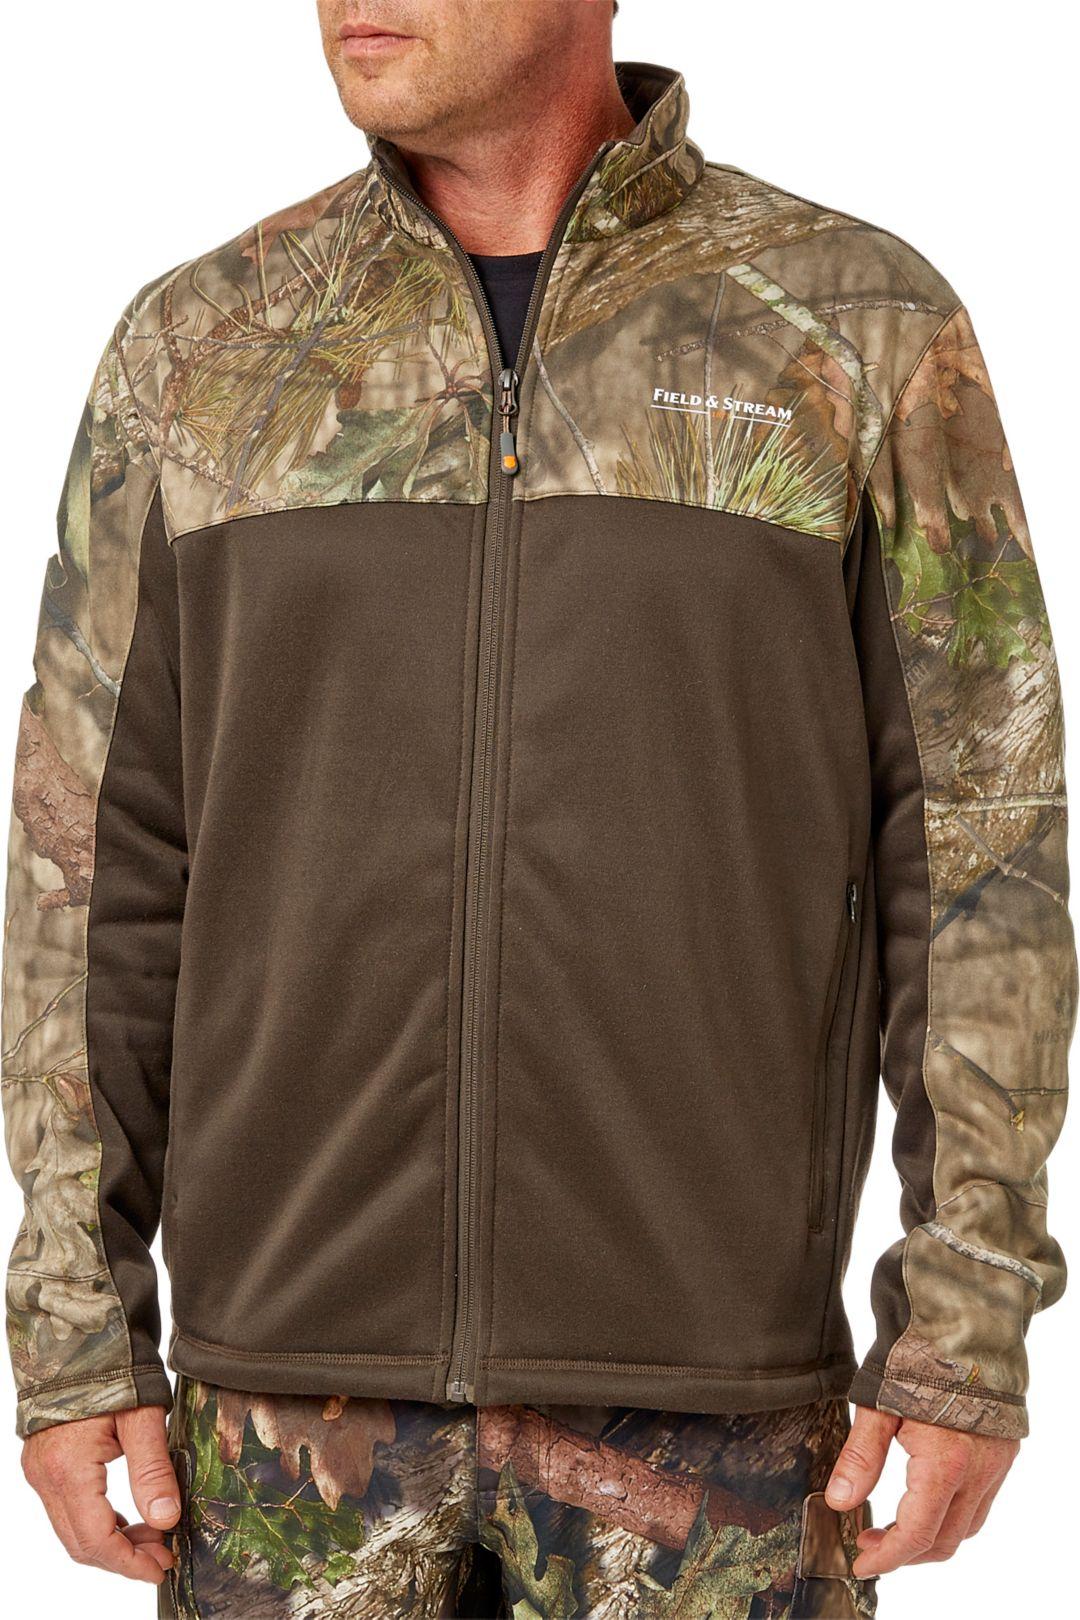 0ac797358ad57 Field & Stream Men's Fleece Hunting Jacket | DICK'S Sporting Goods